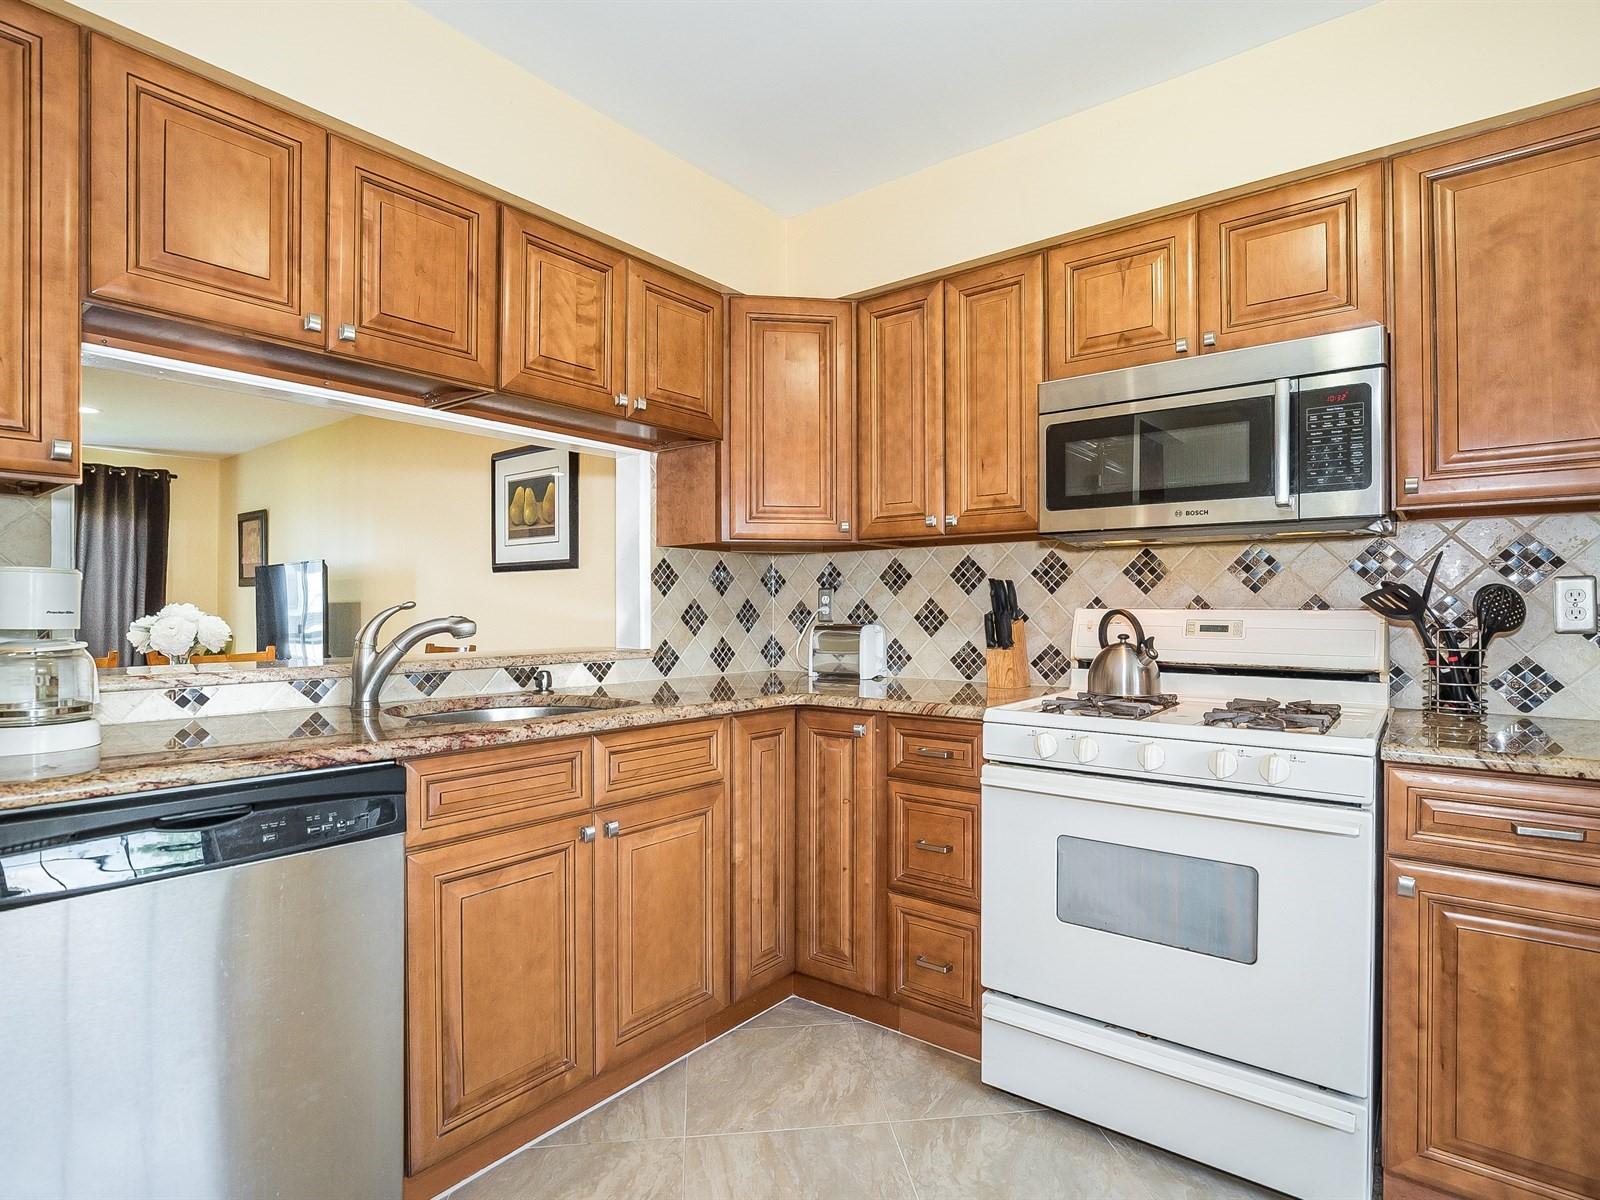 Woodbridge 4 Temporary Housing furnished kitchen